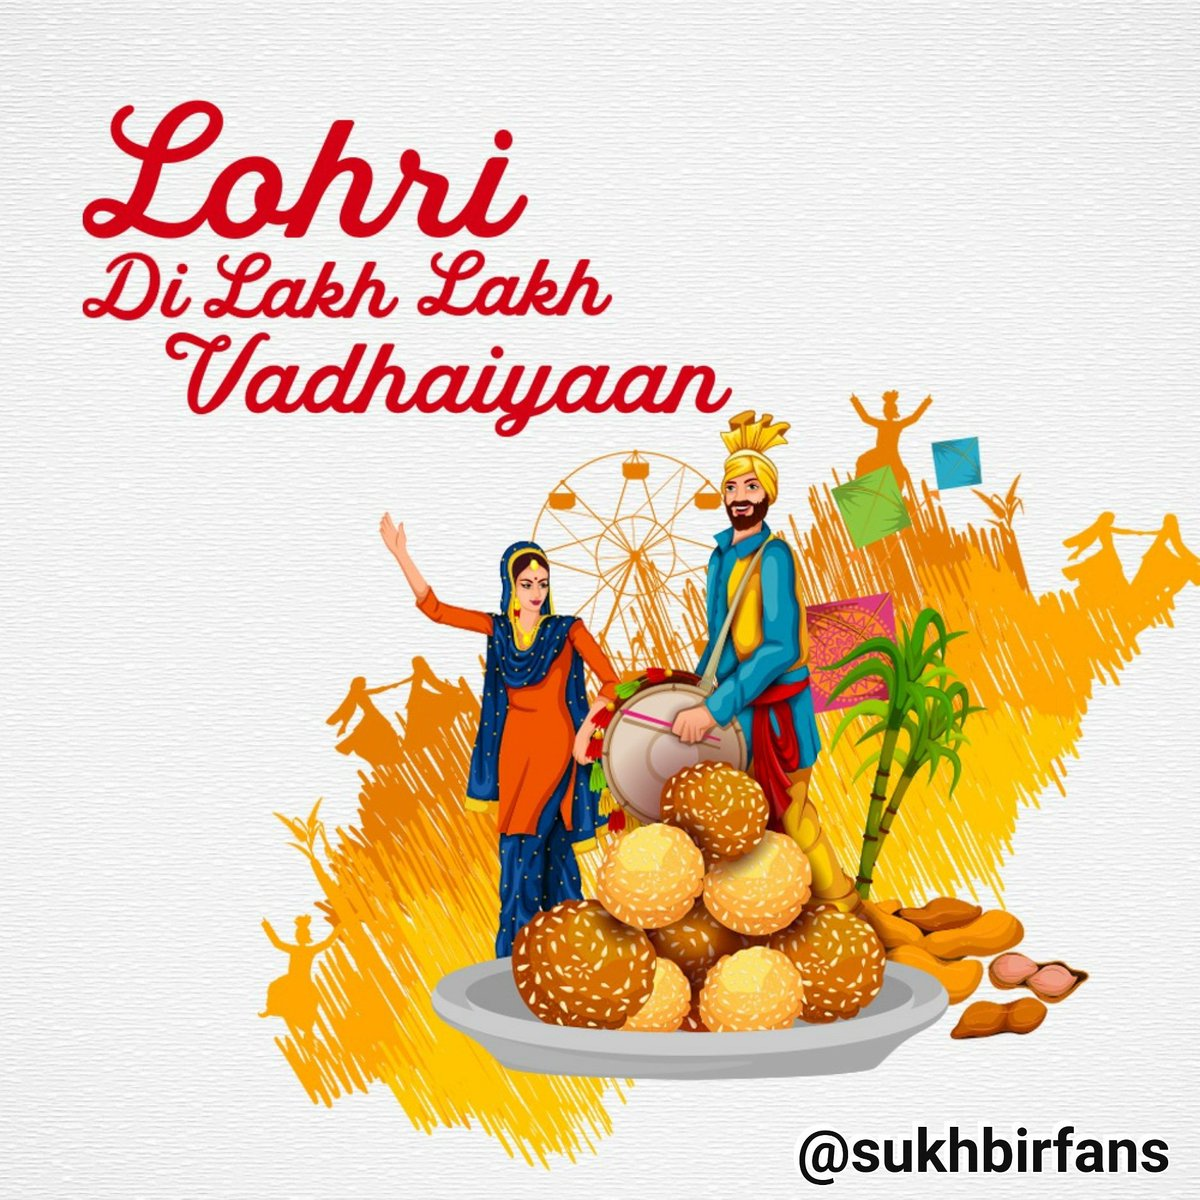 Happy Lohri#rabrakhaੴ . . . #lohri #happylohri#happylohri #SukhbirSinger #sukhbir #sukhbir_singer #sukhbir_singh #sukbir #sukhbirfans #peacepic.twitter.com/iUI9kfTUWU